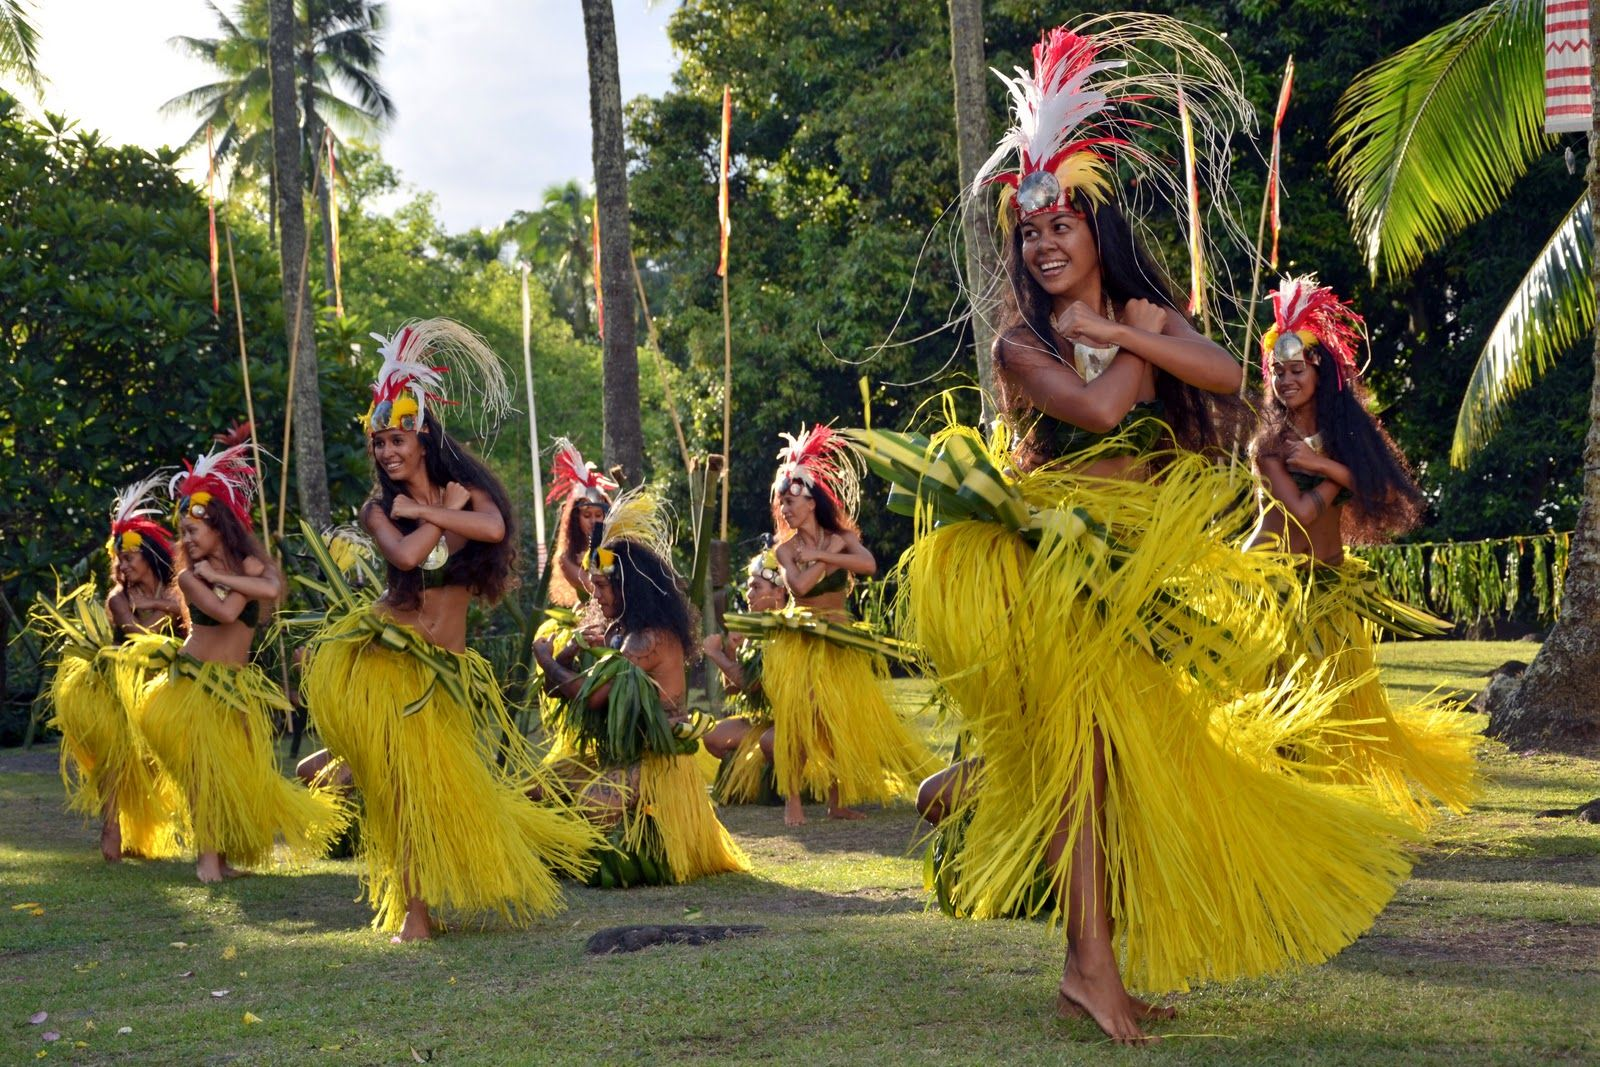 Image associée Tahiti, Polynesian girls, Polynesian